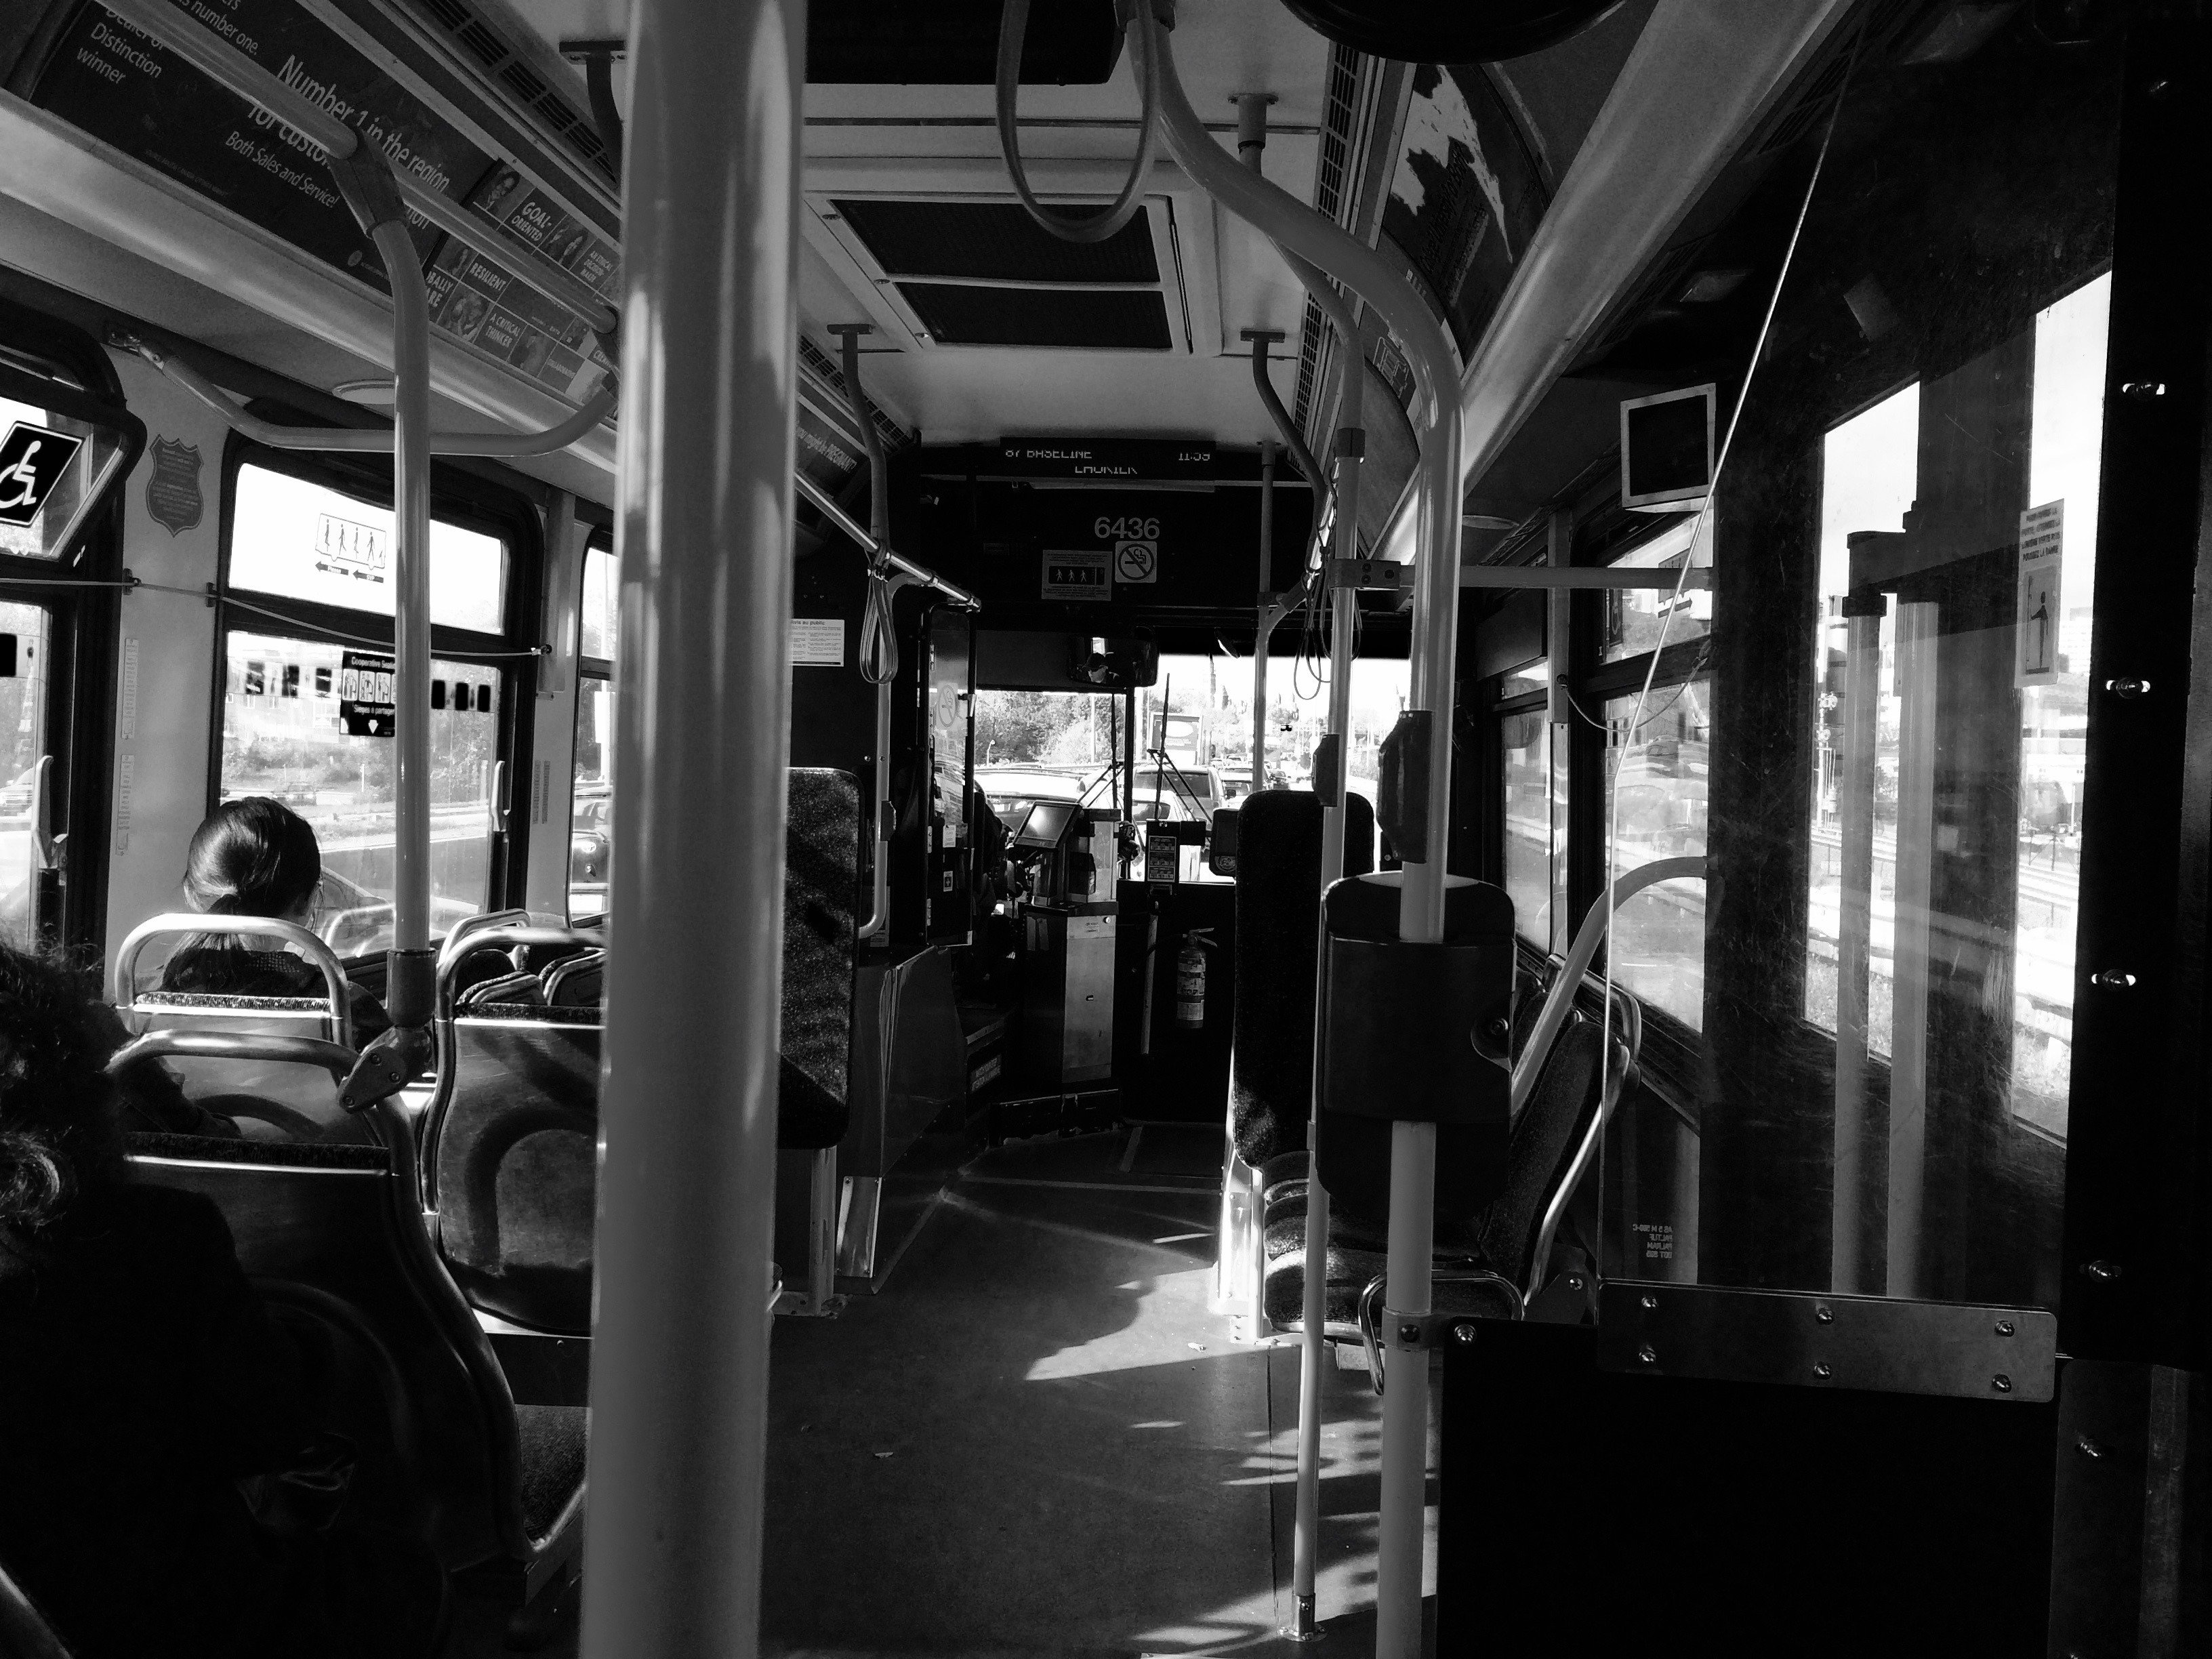 Bus through Dubuque, Iowa